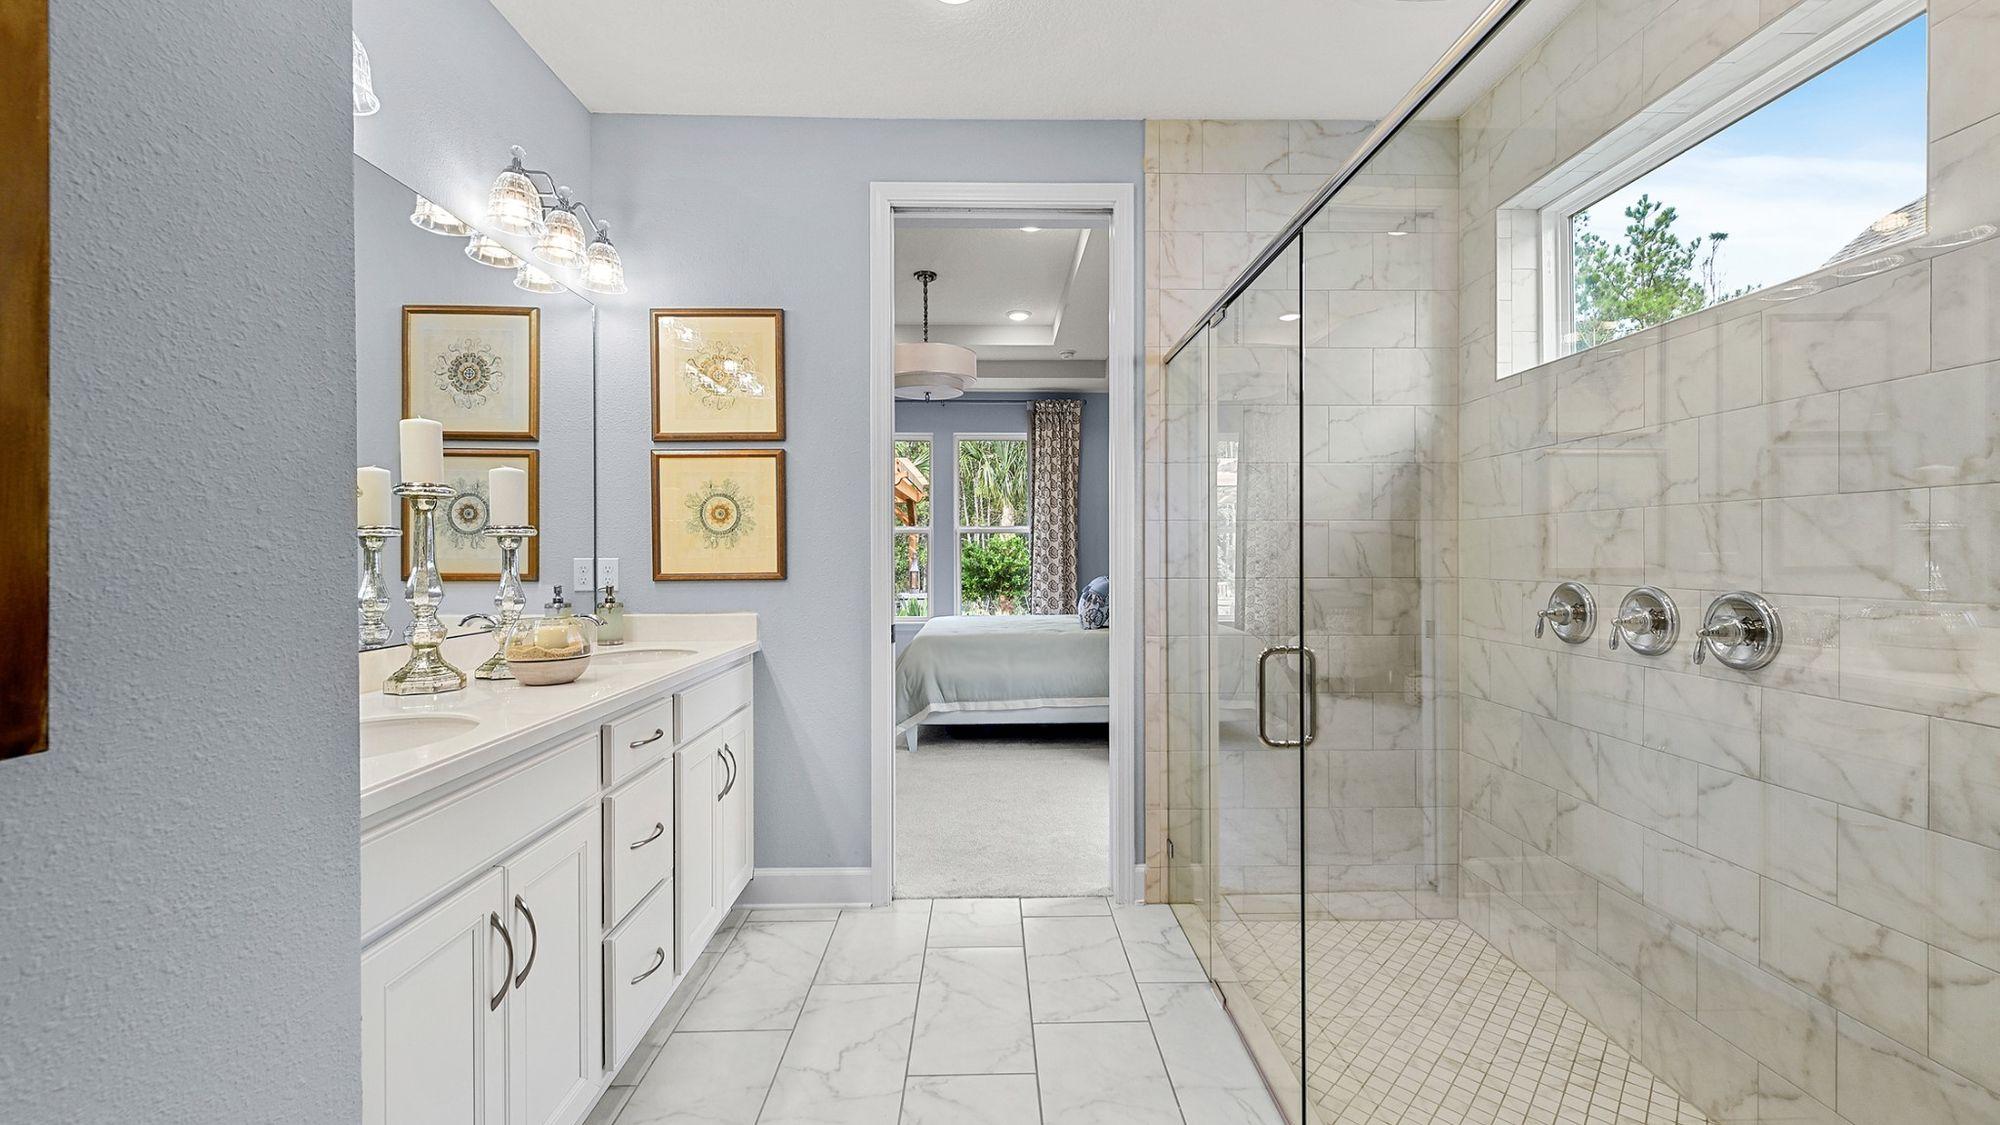 Interior Design Solutions - Builder Selection Center